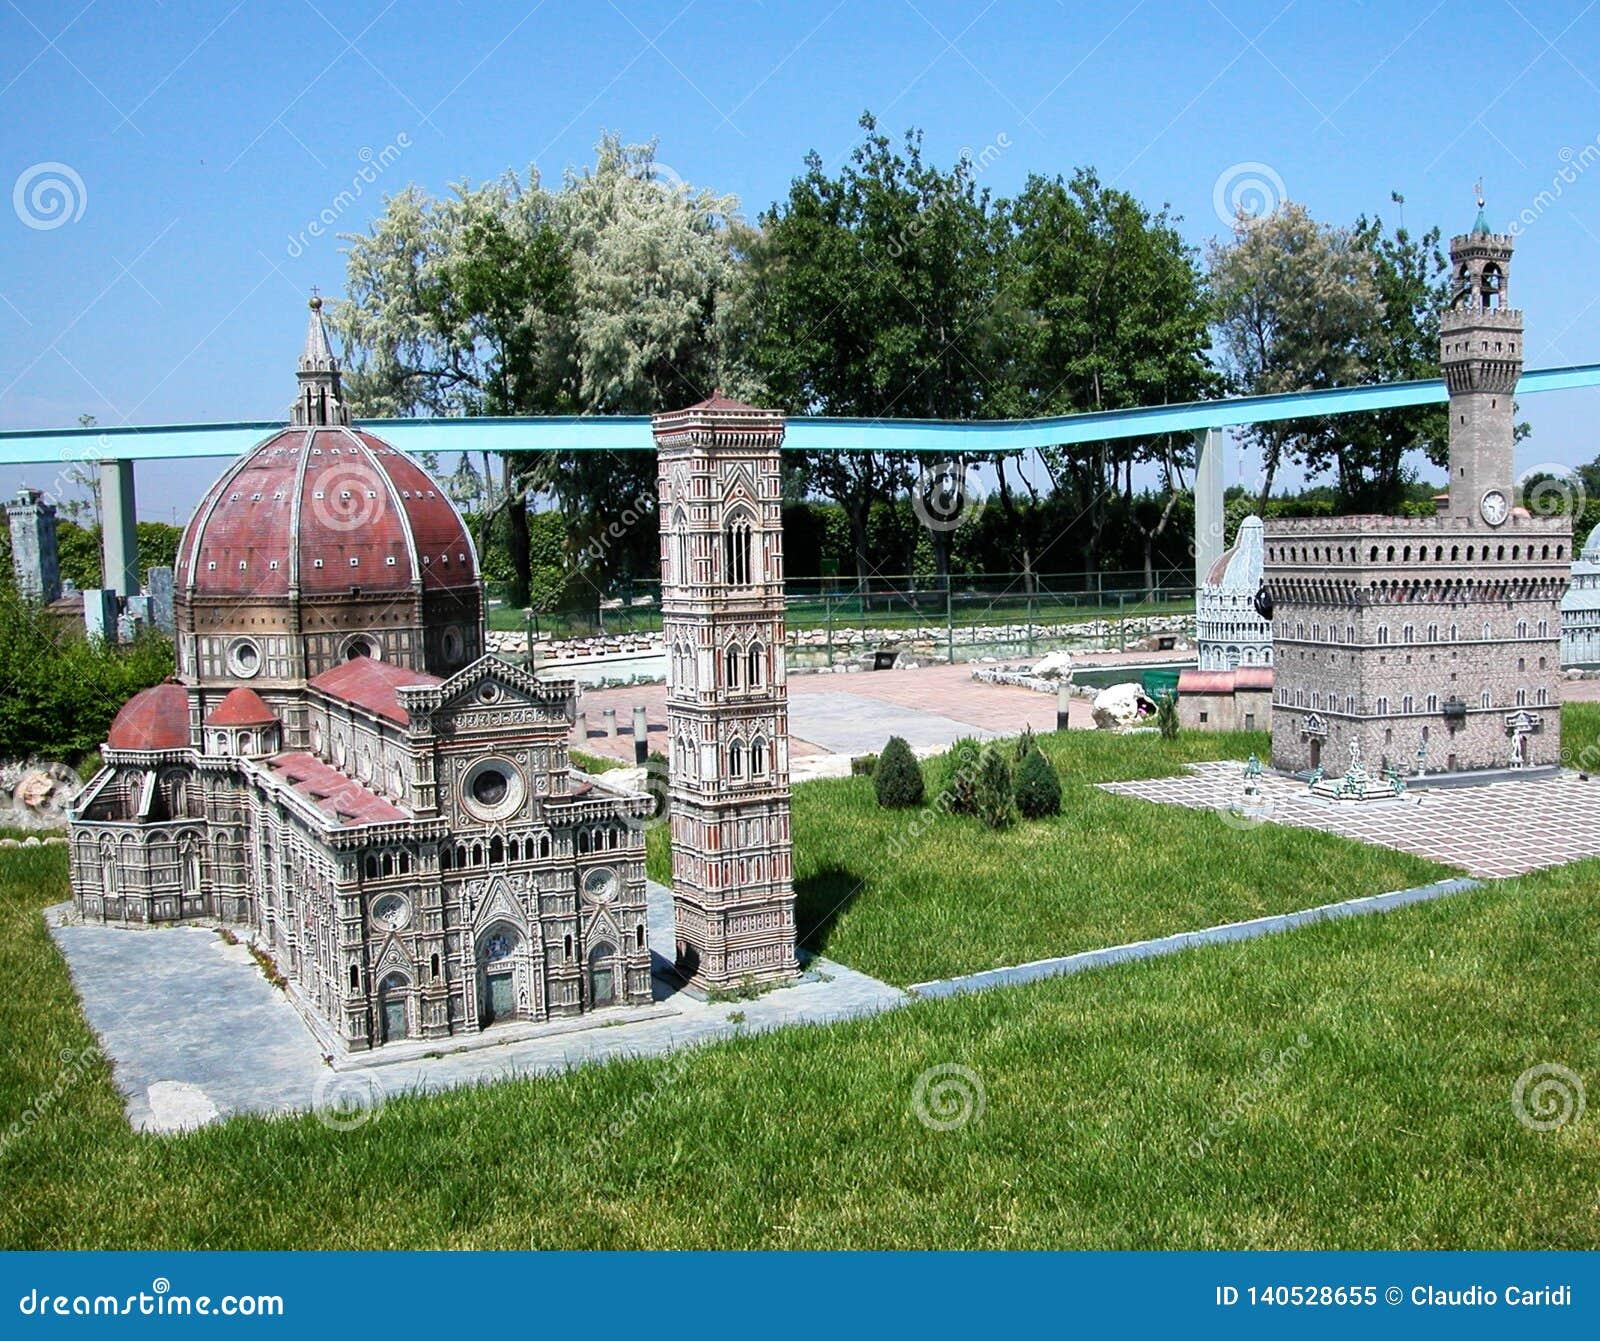 De hoofdmonumenten van Florence in het thema parkeren 'Italië in miniatuur 'Italië in miniatura Viserba, Rimini, Italië